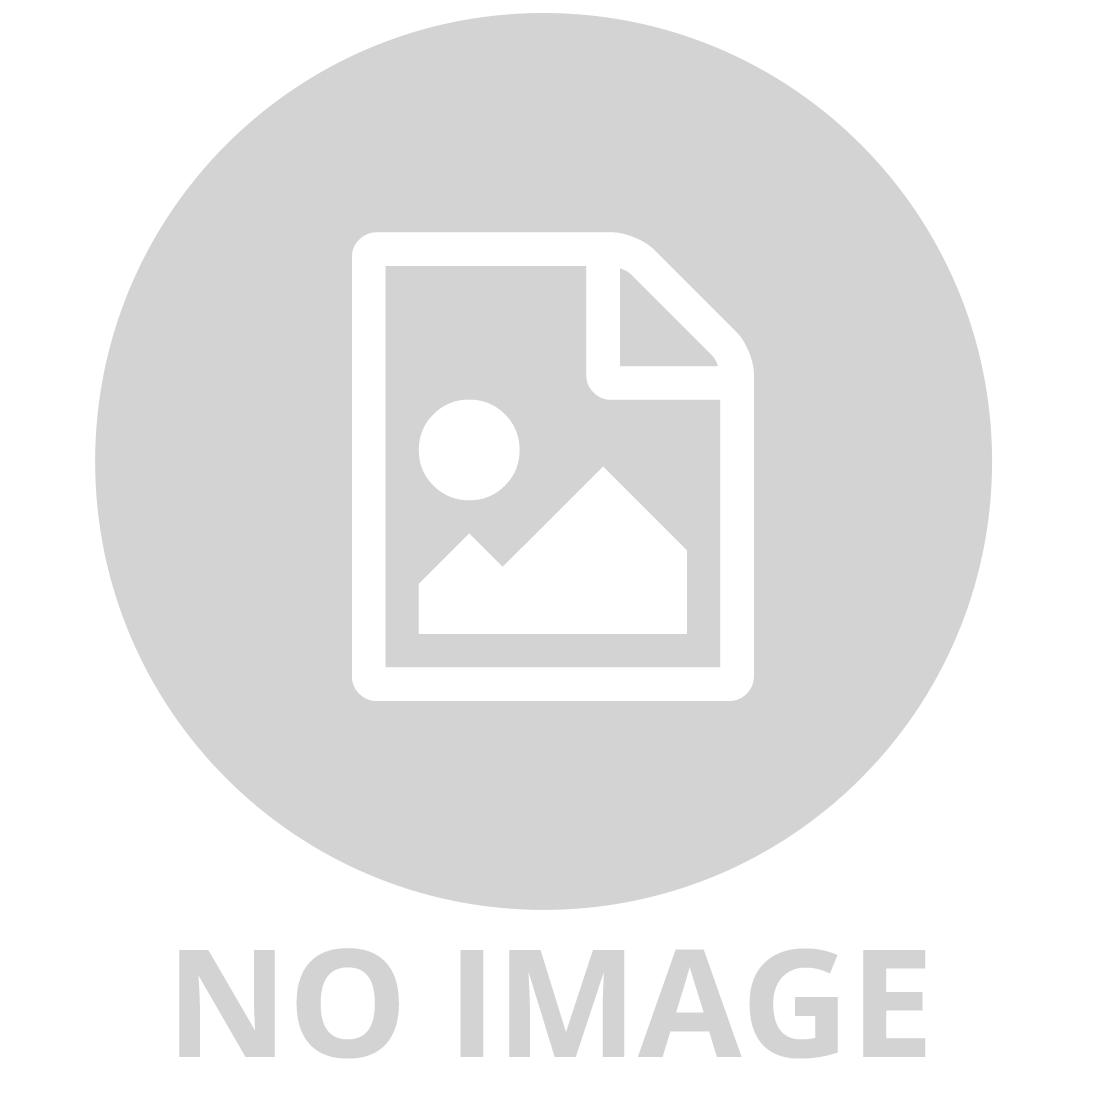 LEGO STAR WARS MICROFIGHTER 75196 TIE SILENCER